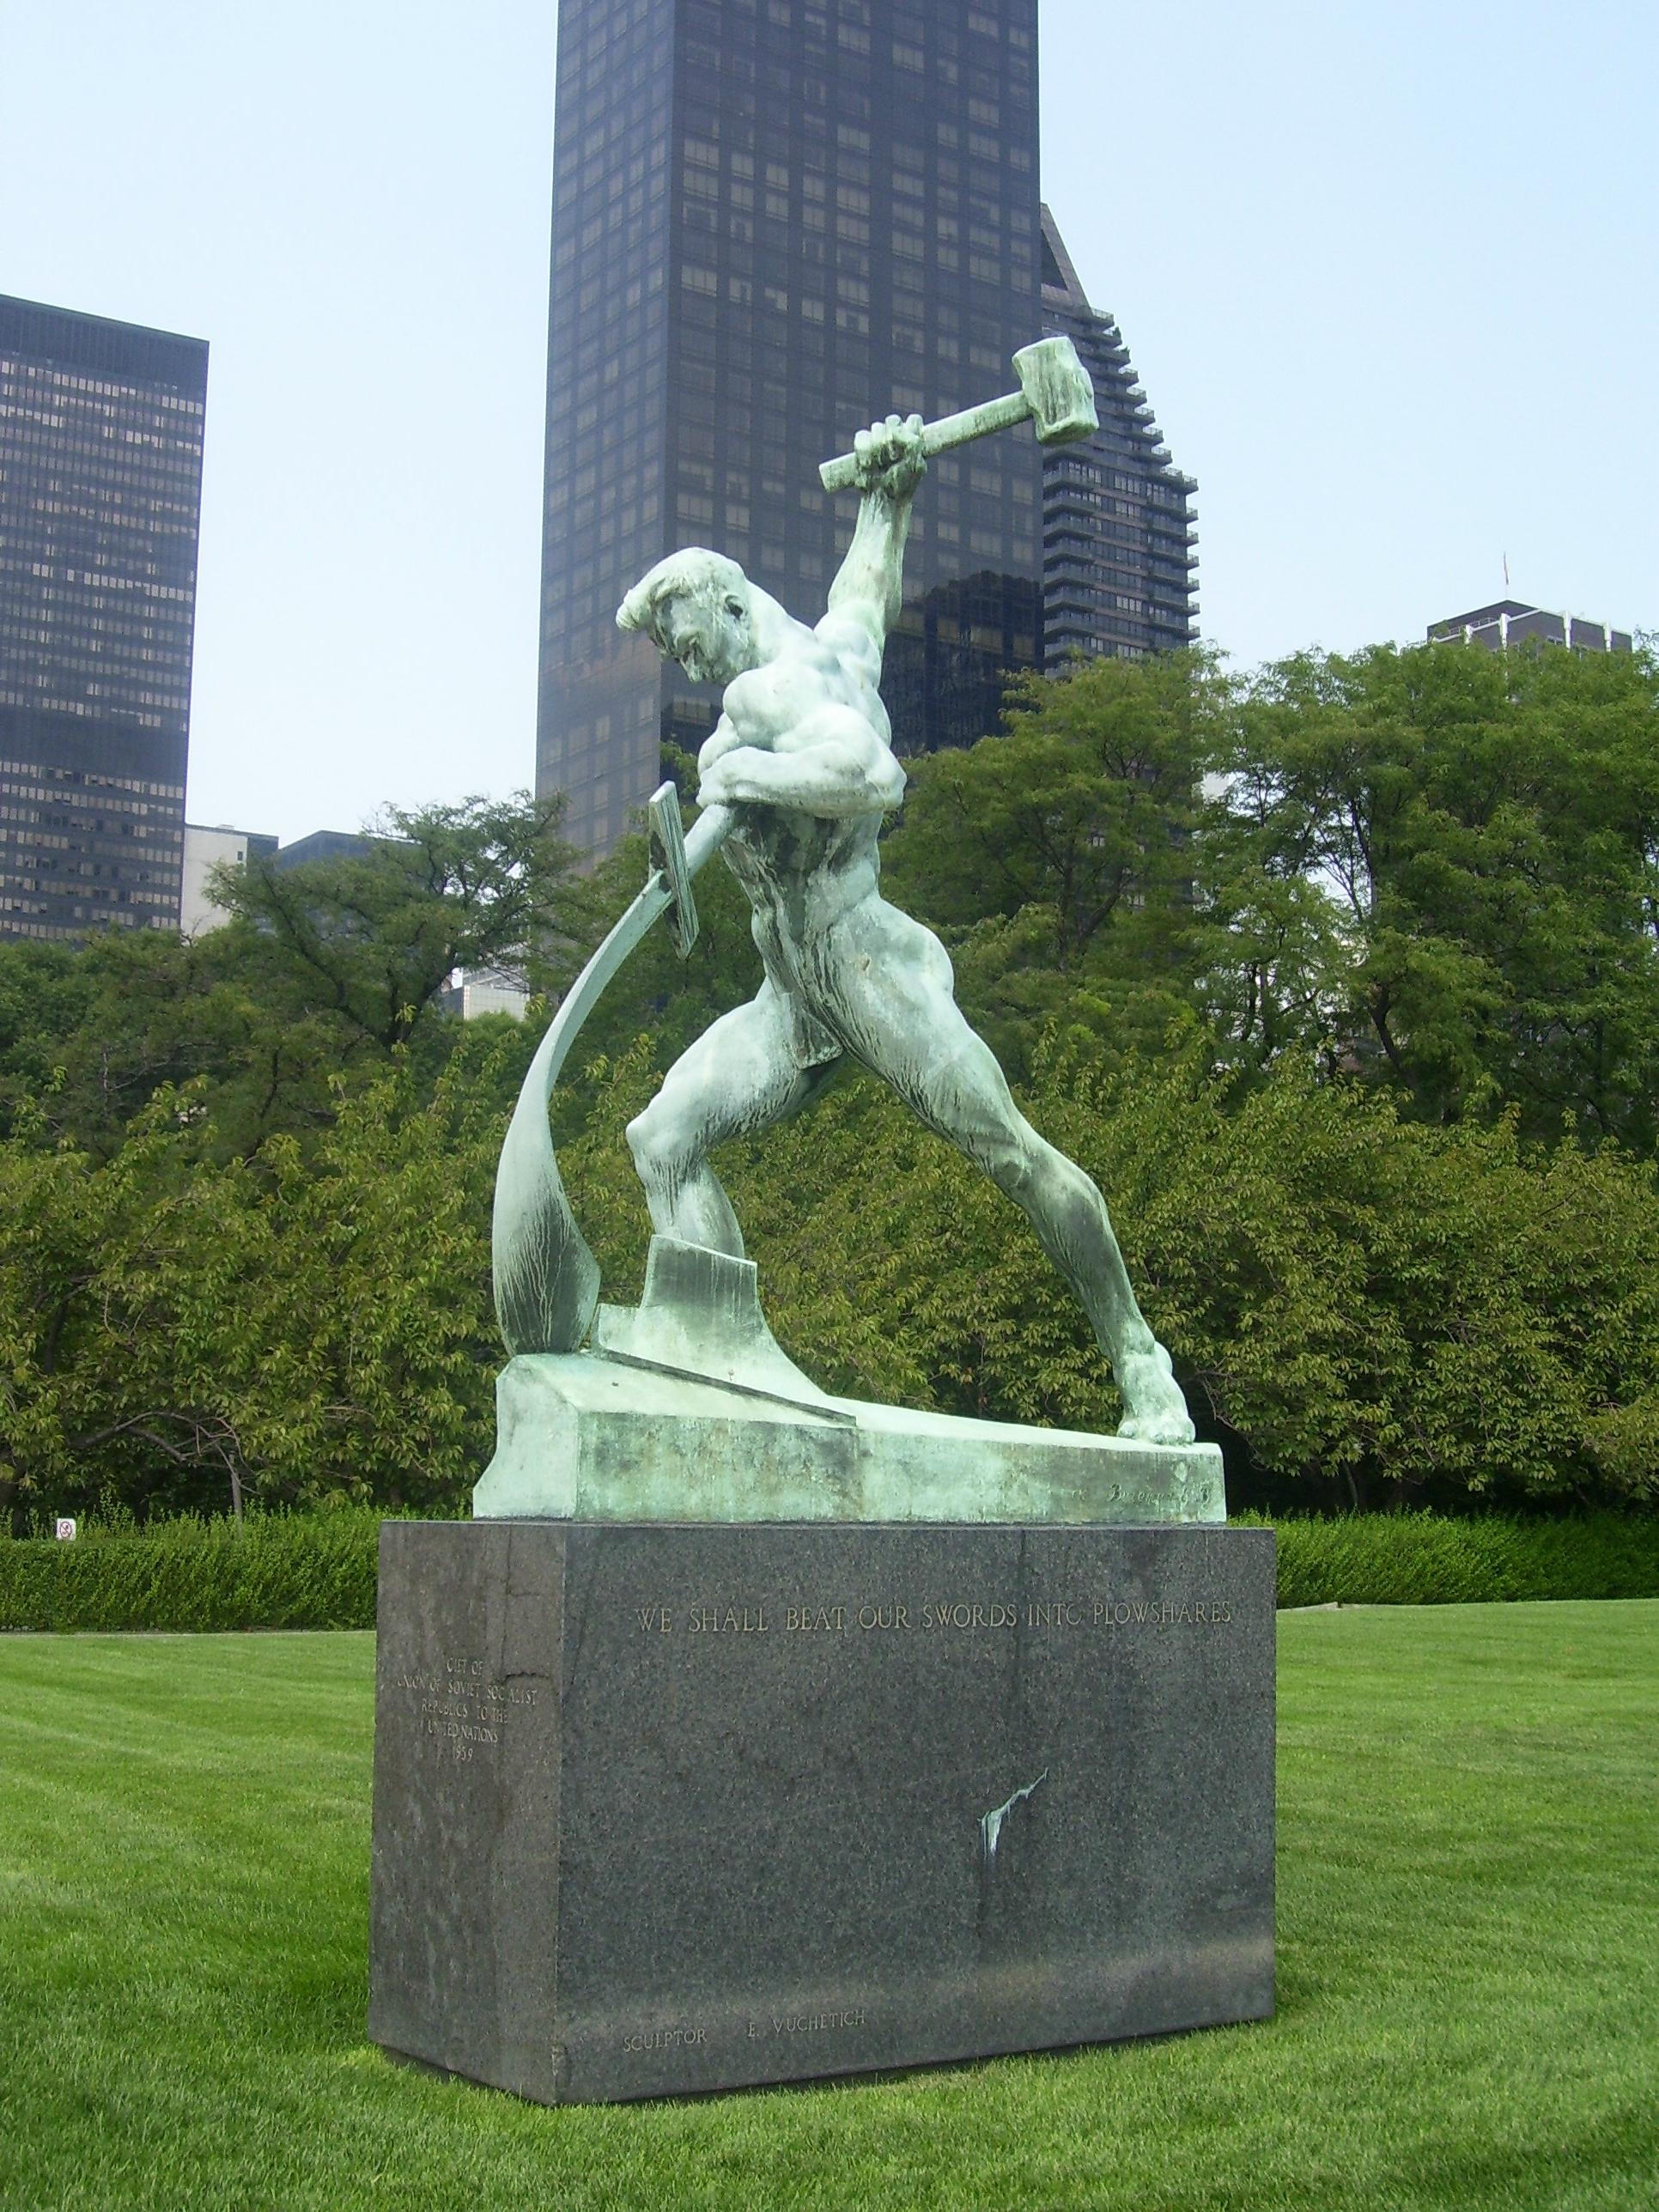 UN Headquarters, New York